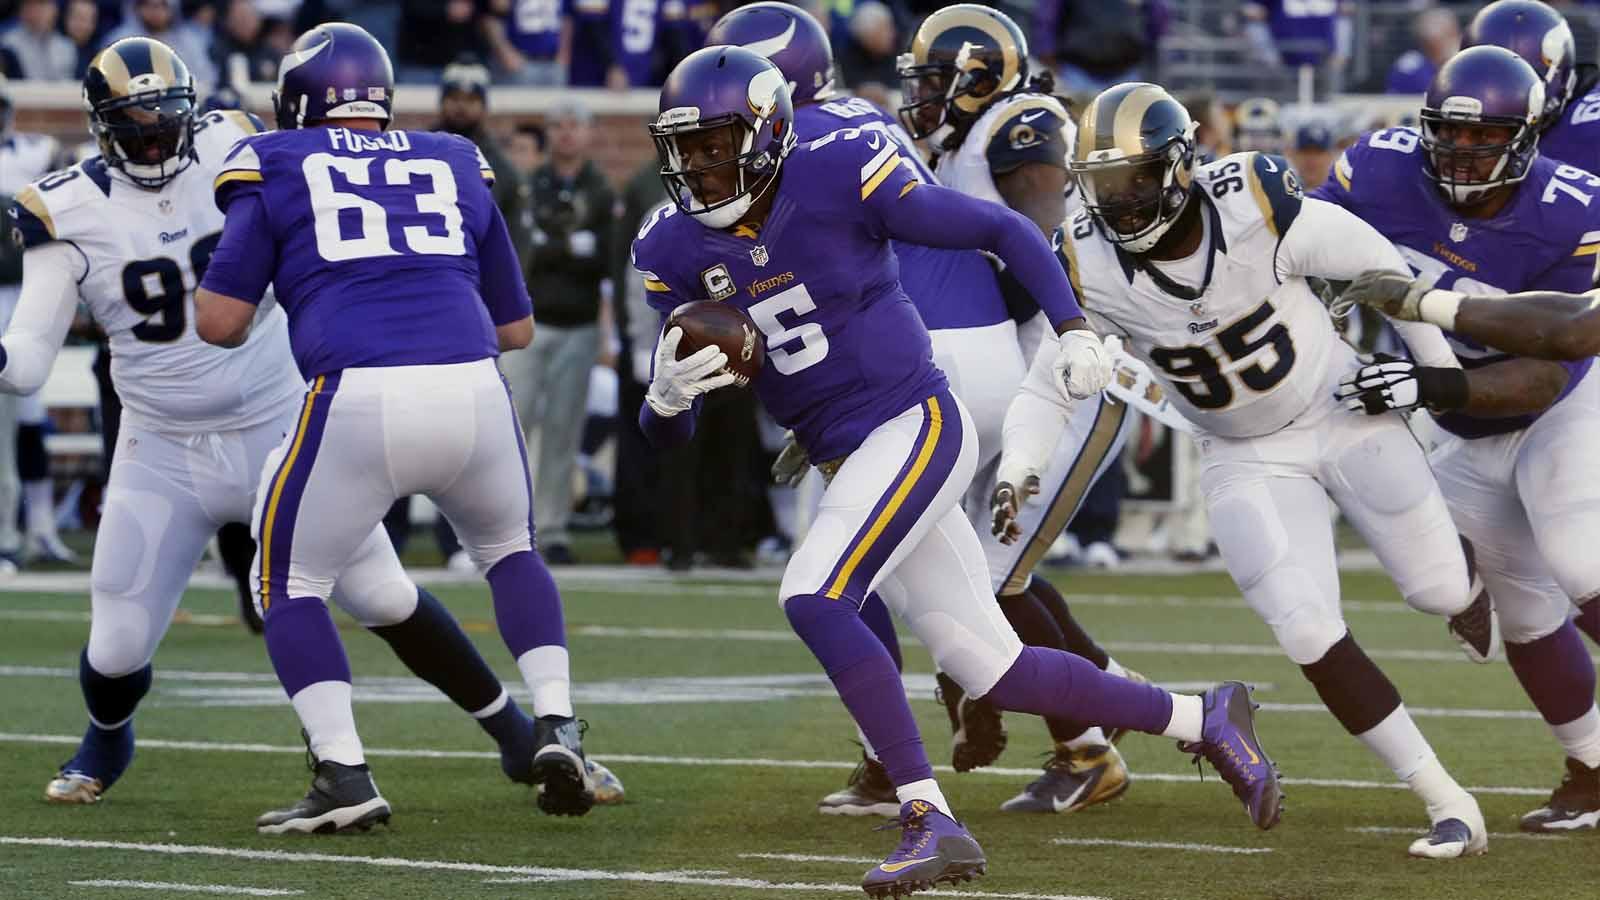 Rams' Joyner fined for Bridgewater hit